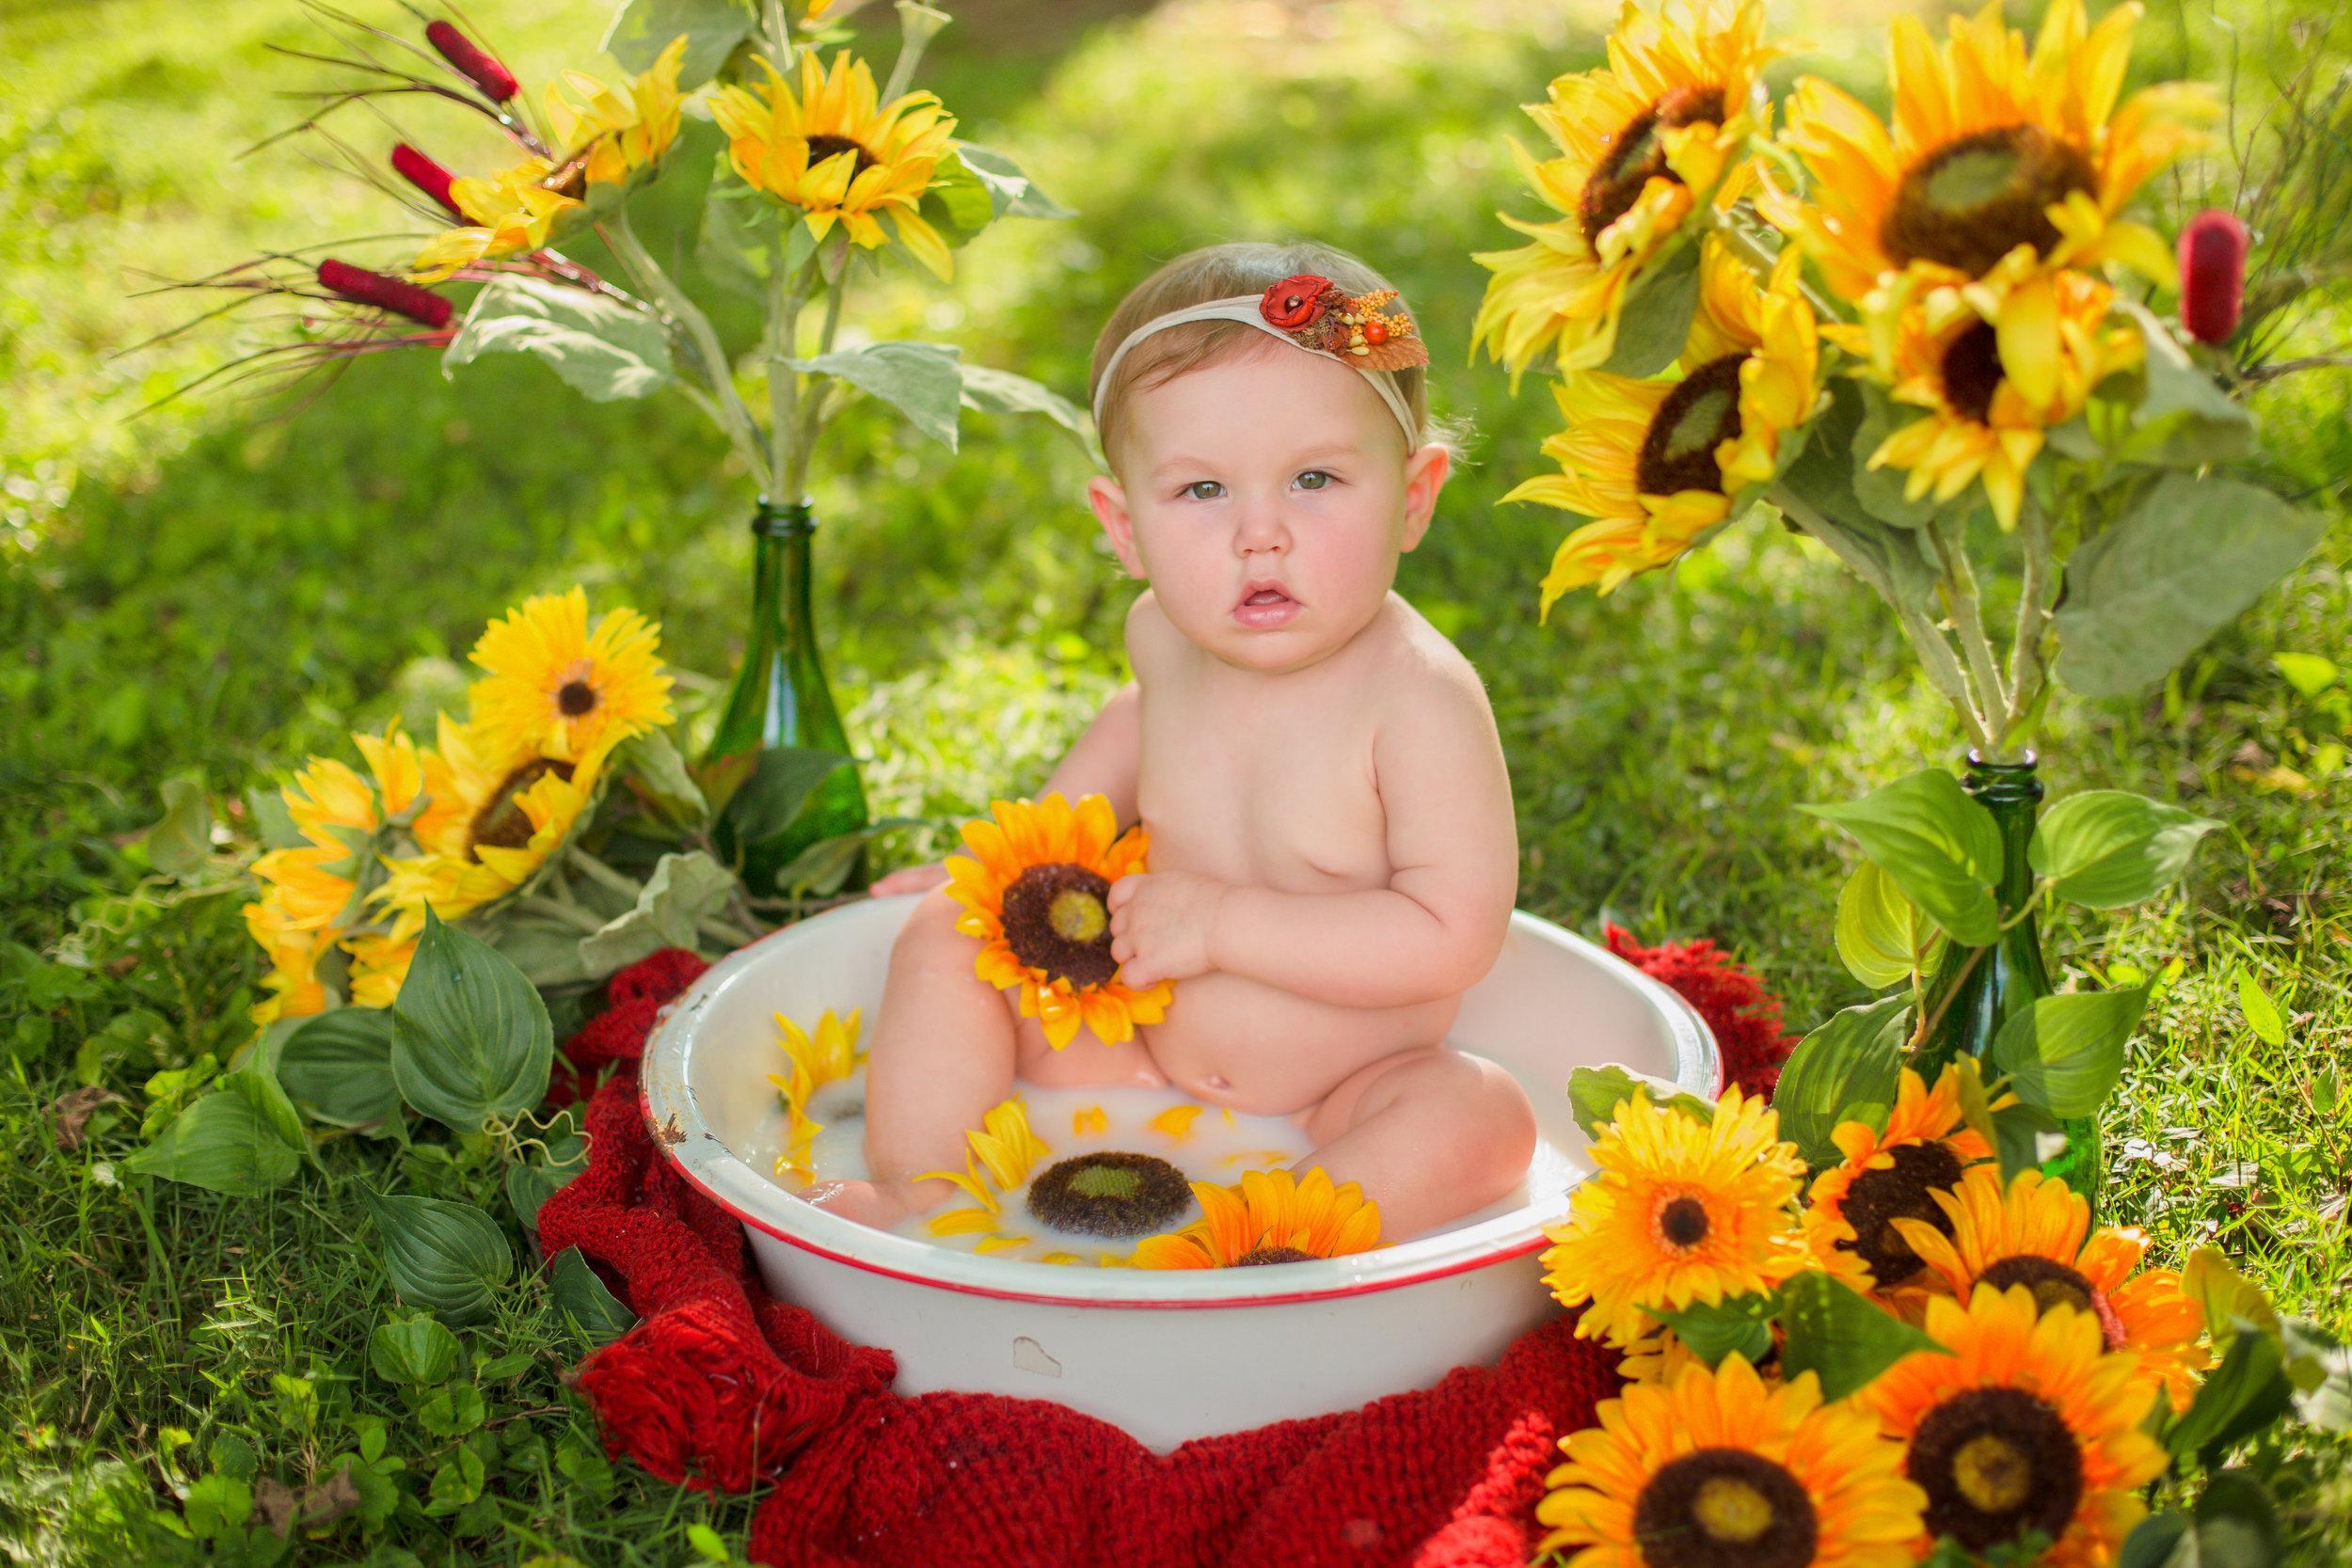 Sawyer-Jo-Sunflower-Milk-bath-Nashville-Family-Photographer-Chelsea-Meadows-Photography-(5).jpg